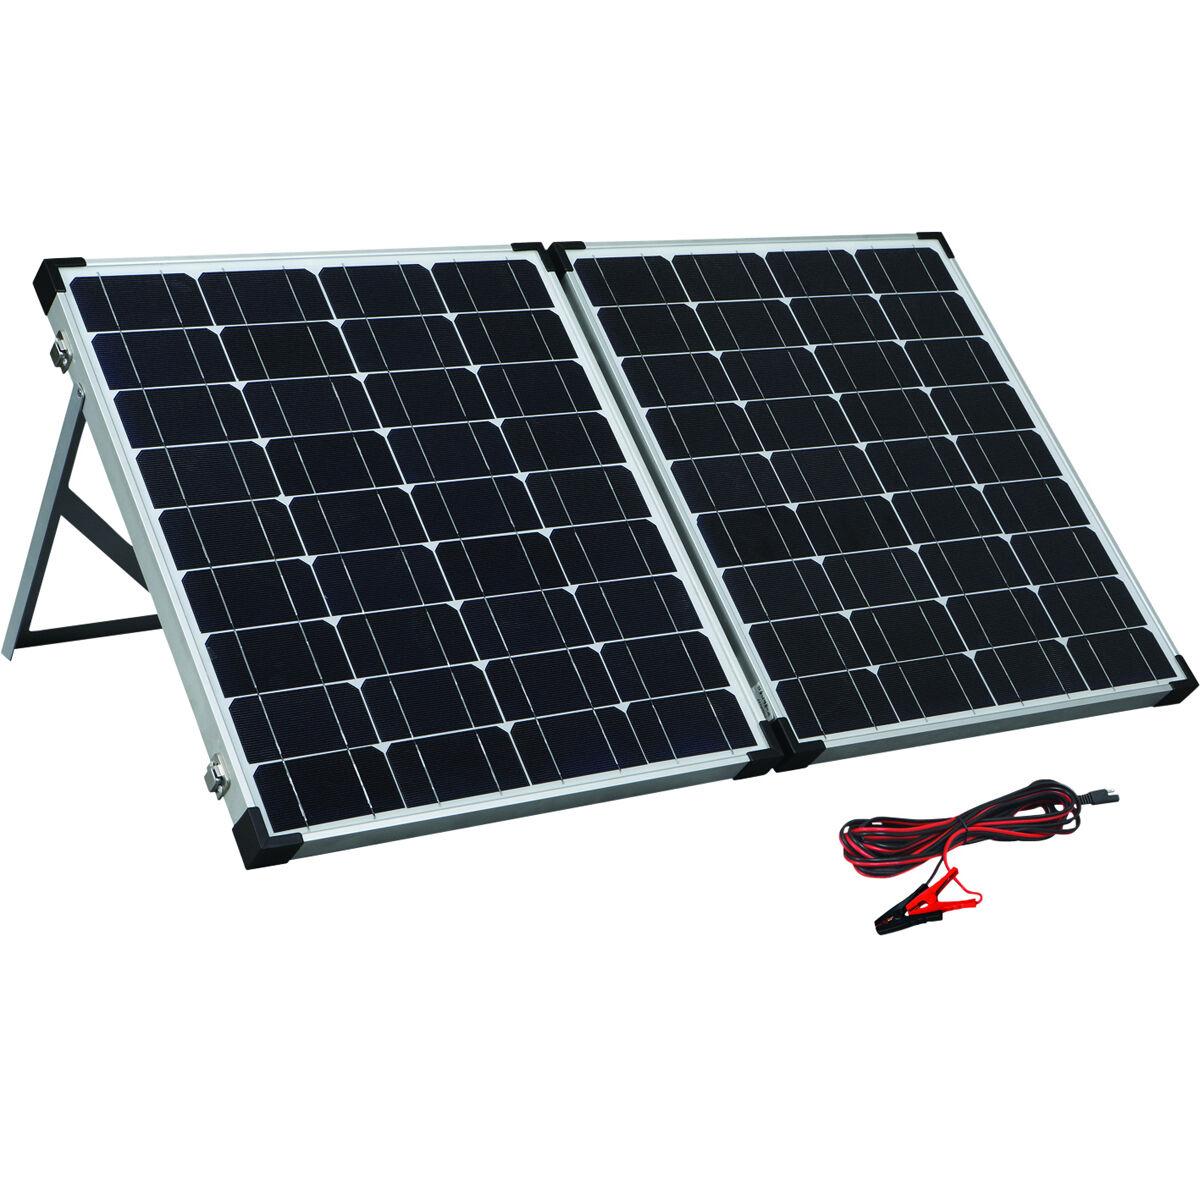 Solution X 100w Folding Solar Panel Kit Bcf